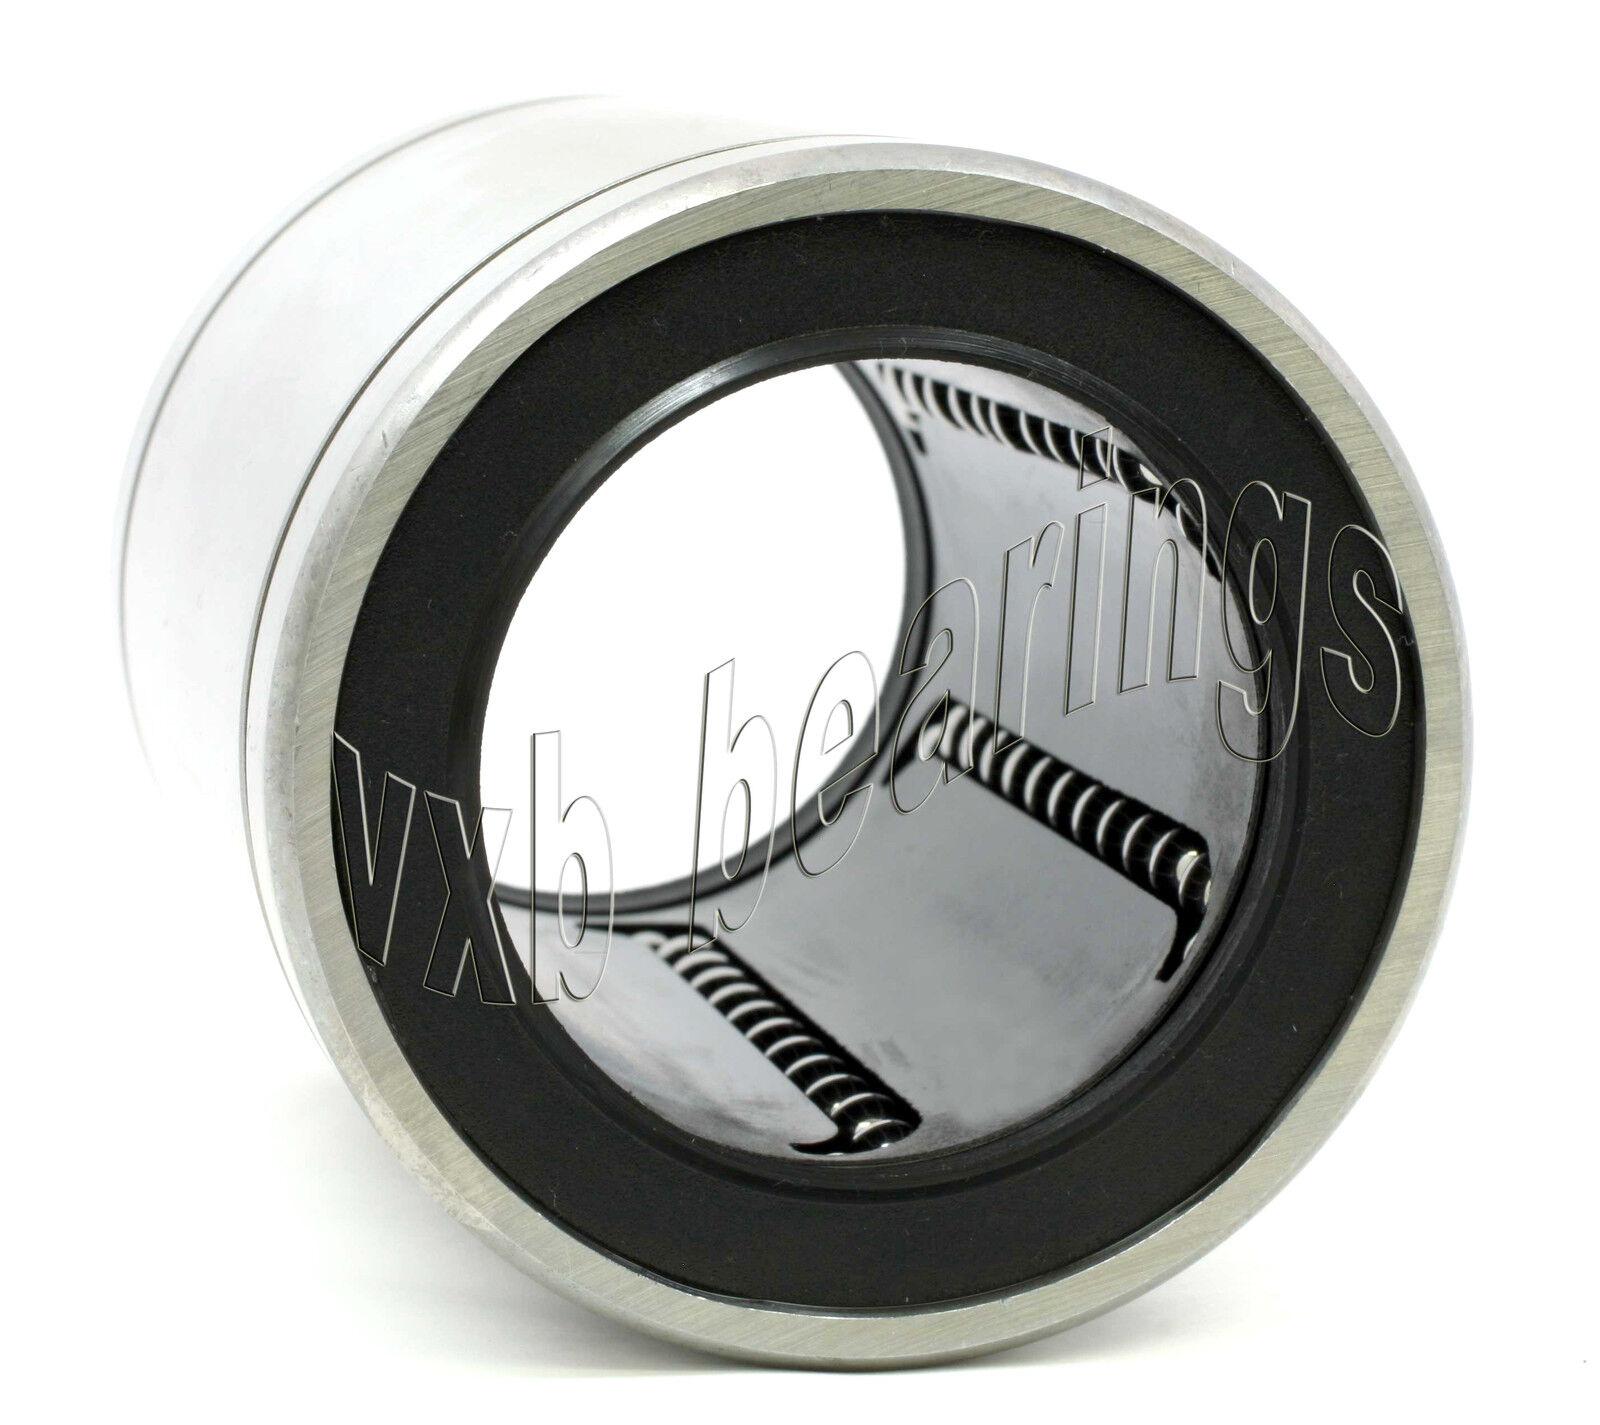 KB12UU NB Bearing Systems 12mm Ball Bushings Linear Motion Bearings